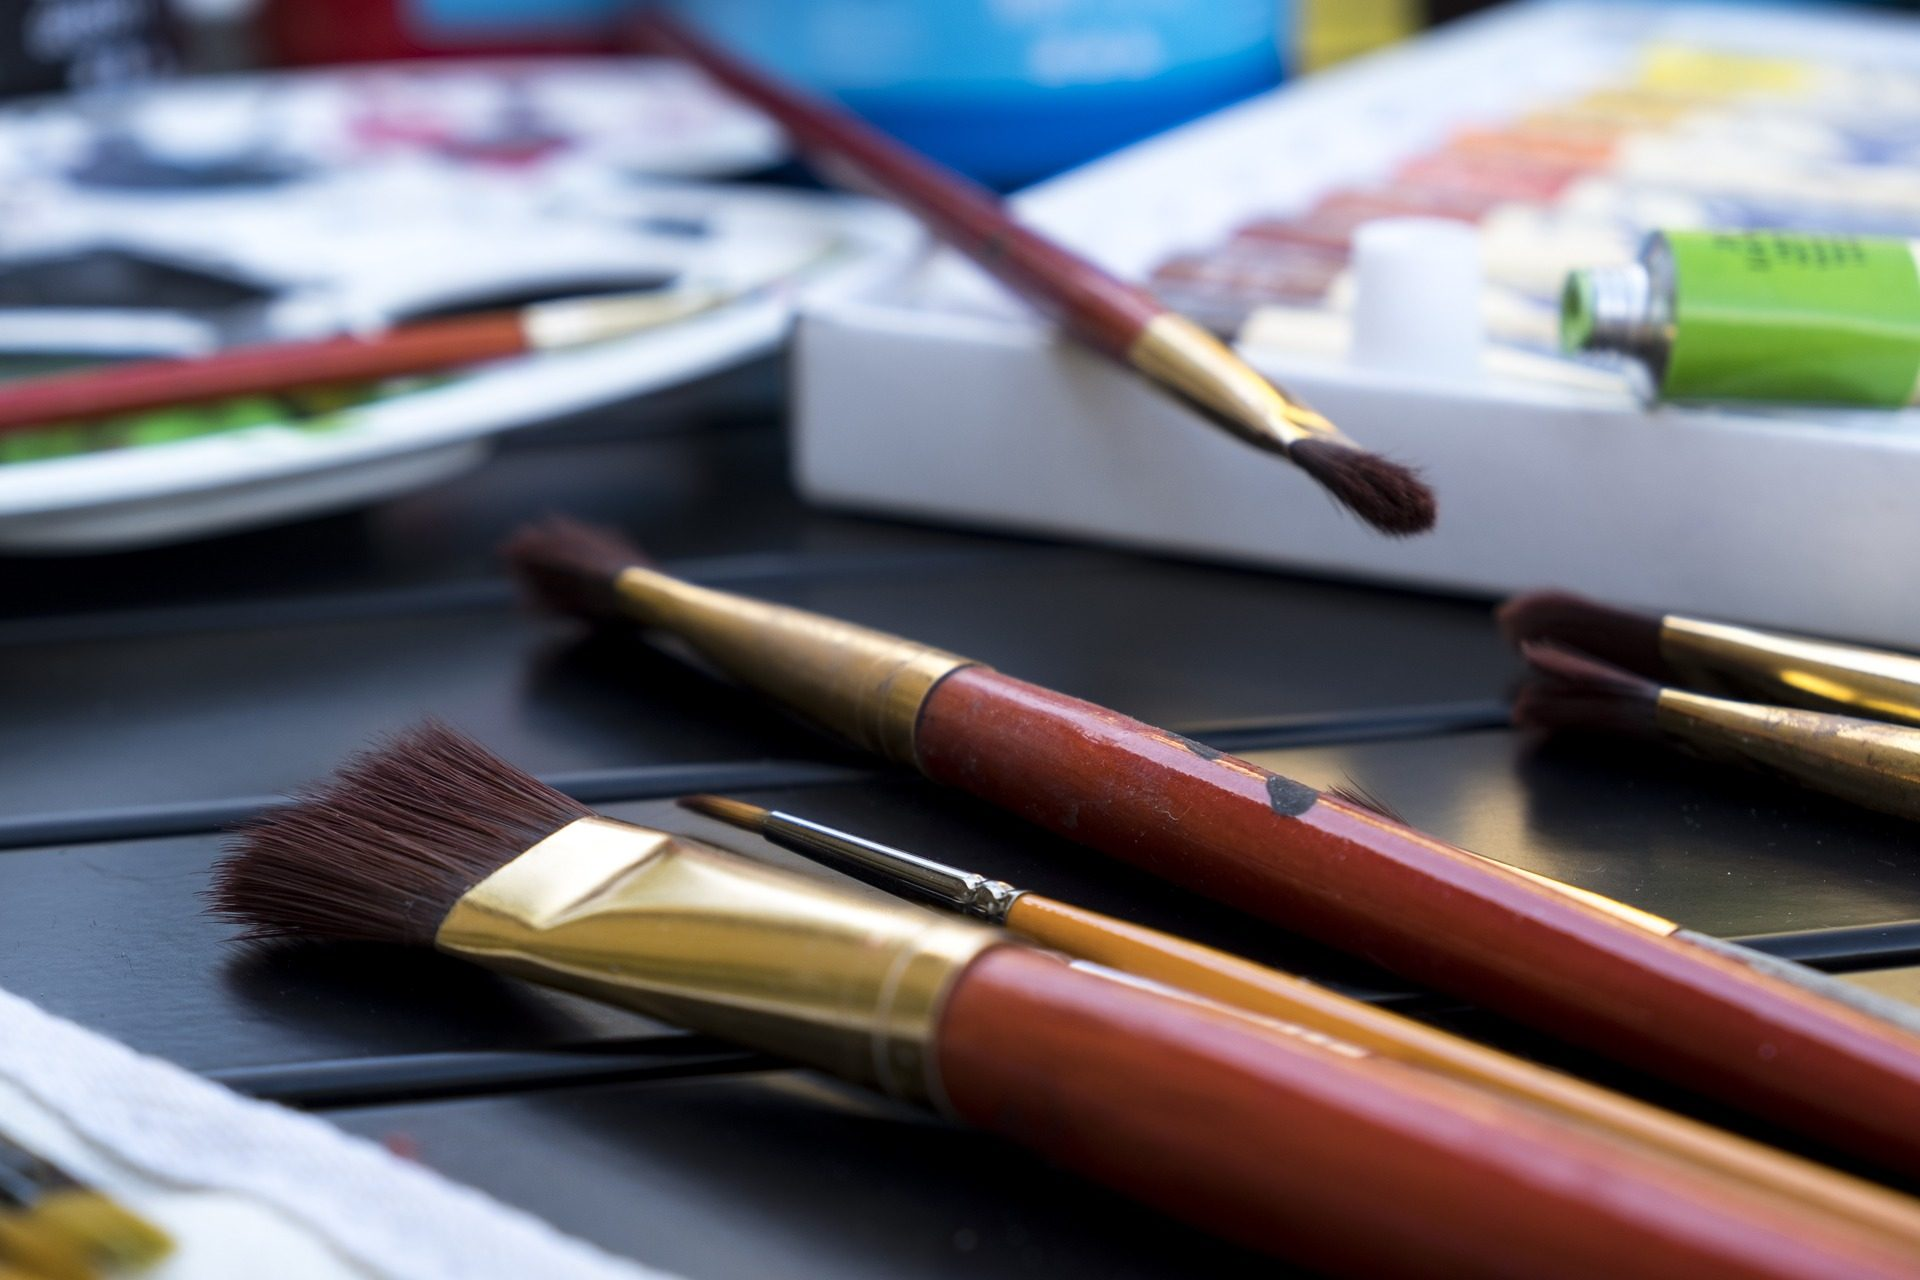 pinceles, لوحاتفرشas, الألوان, اﻷكريليك - خلفيات عالية الدقة - أستاذ falken.com